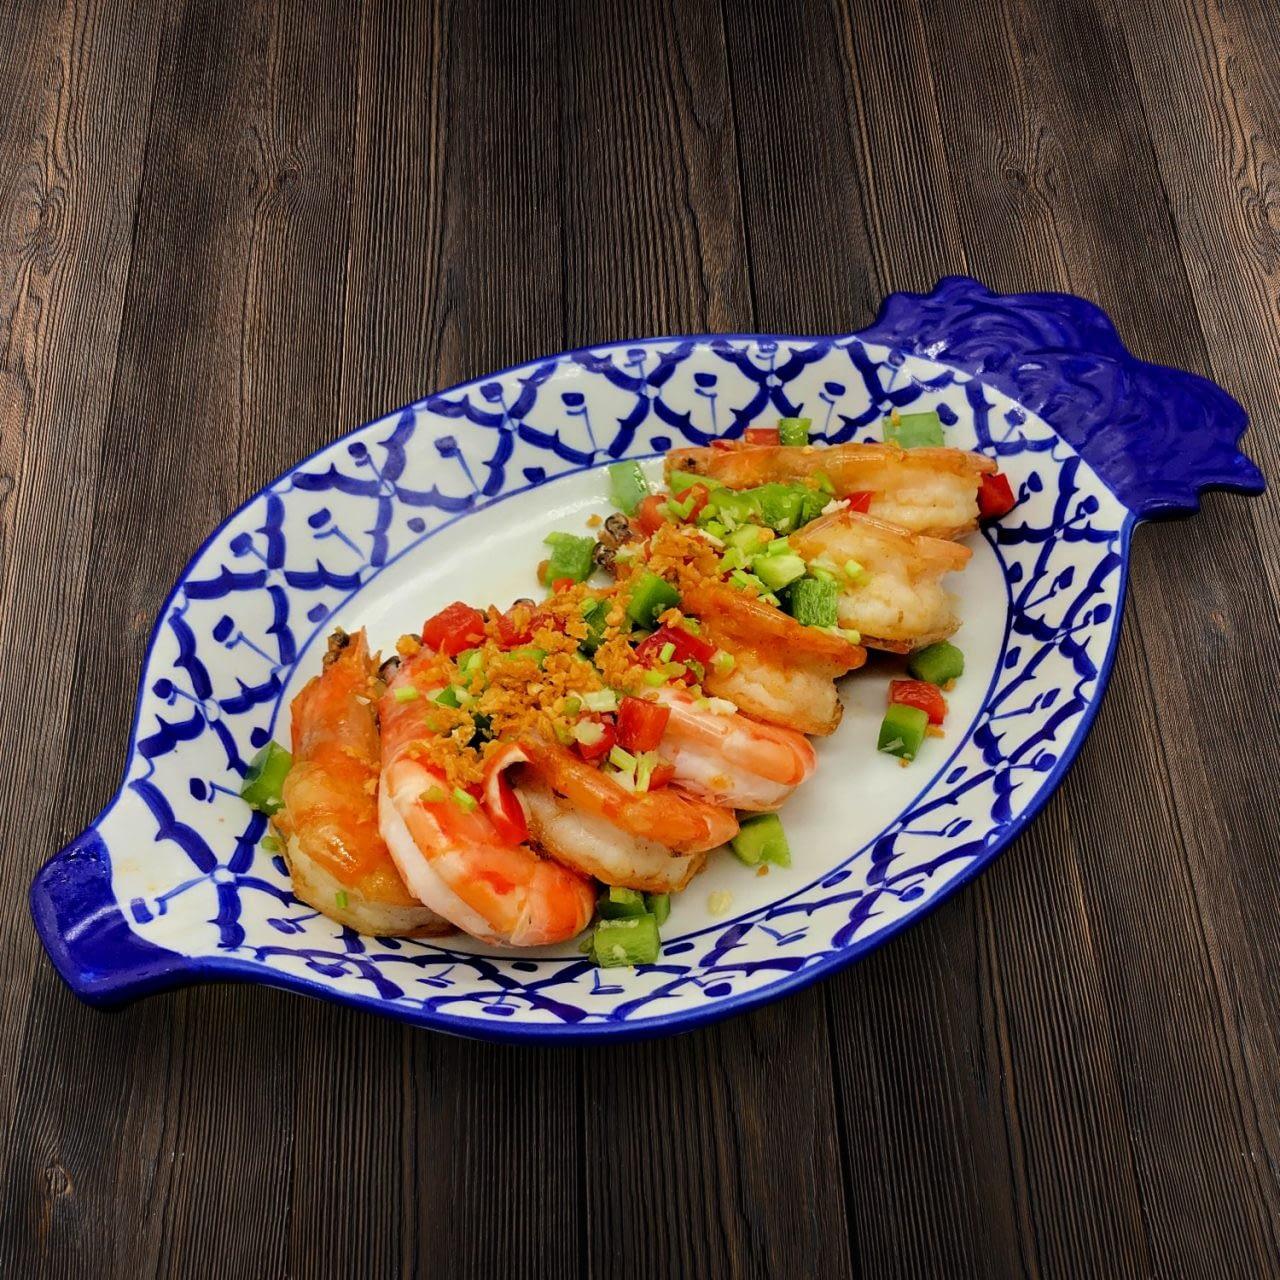 Thai Food Delivery Kuala Lumpur Garlic _ Chilies Prawn